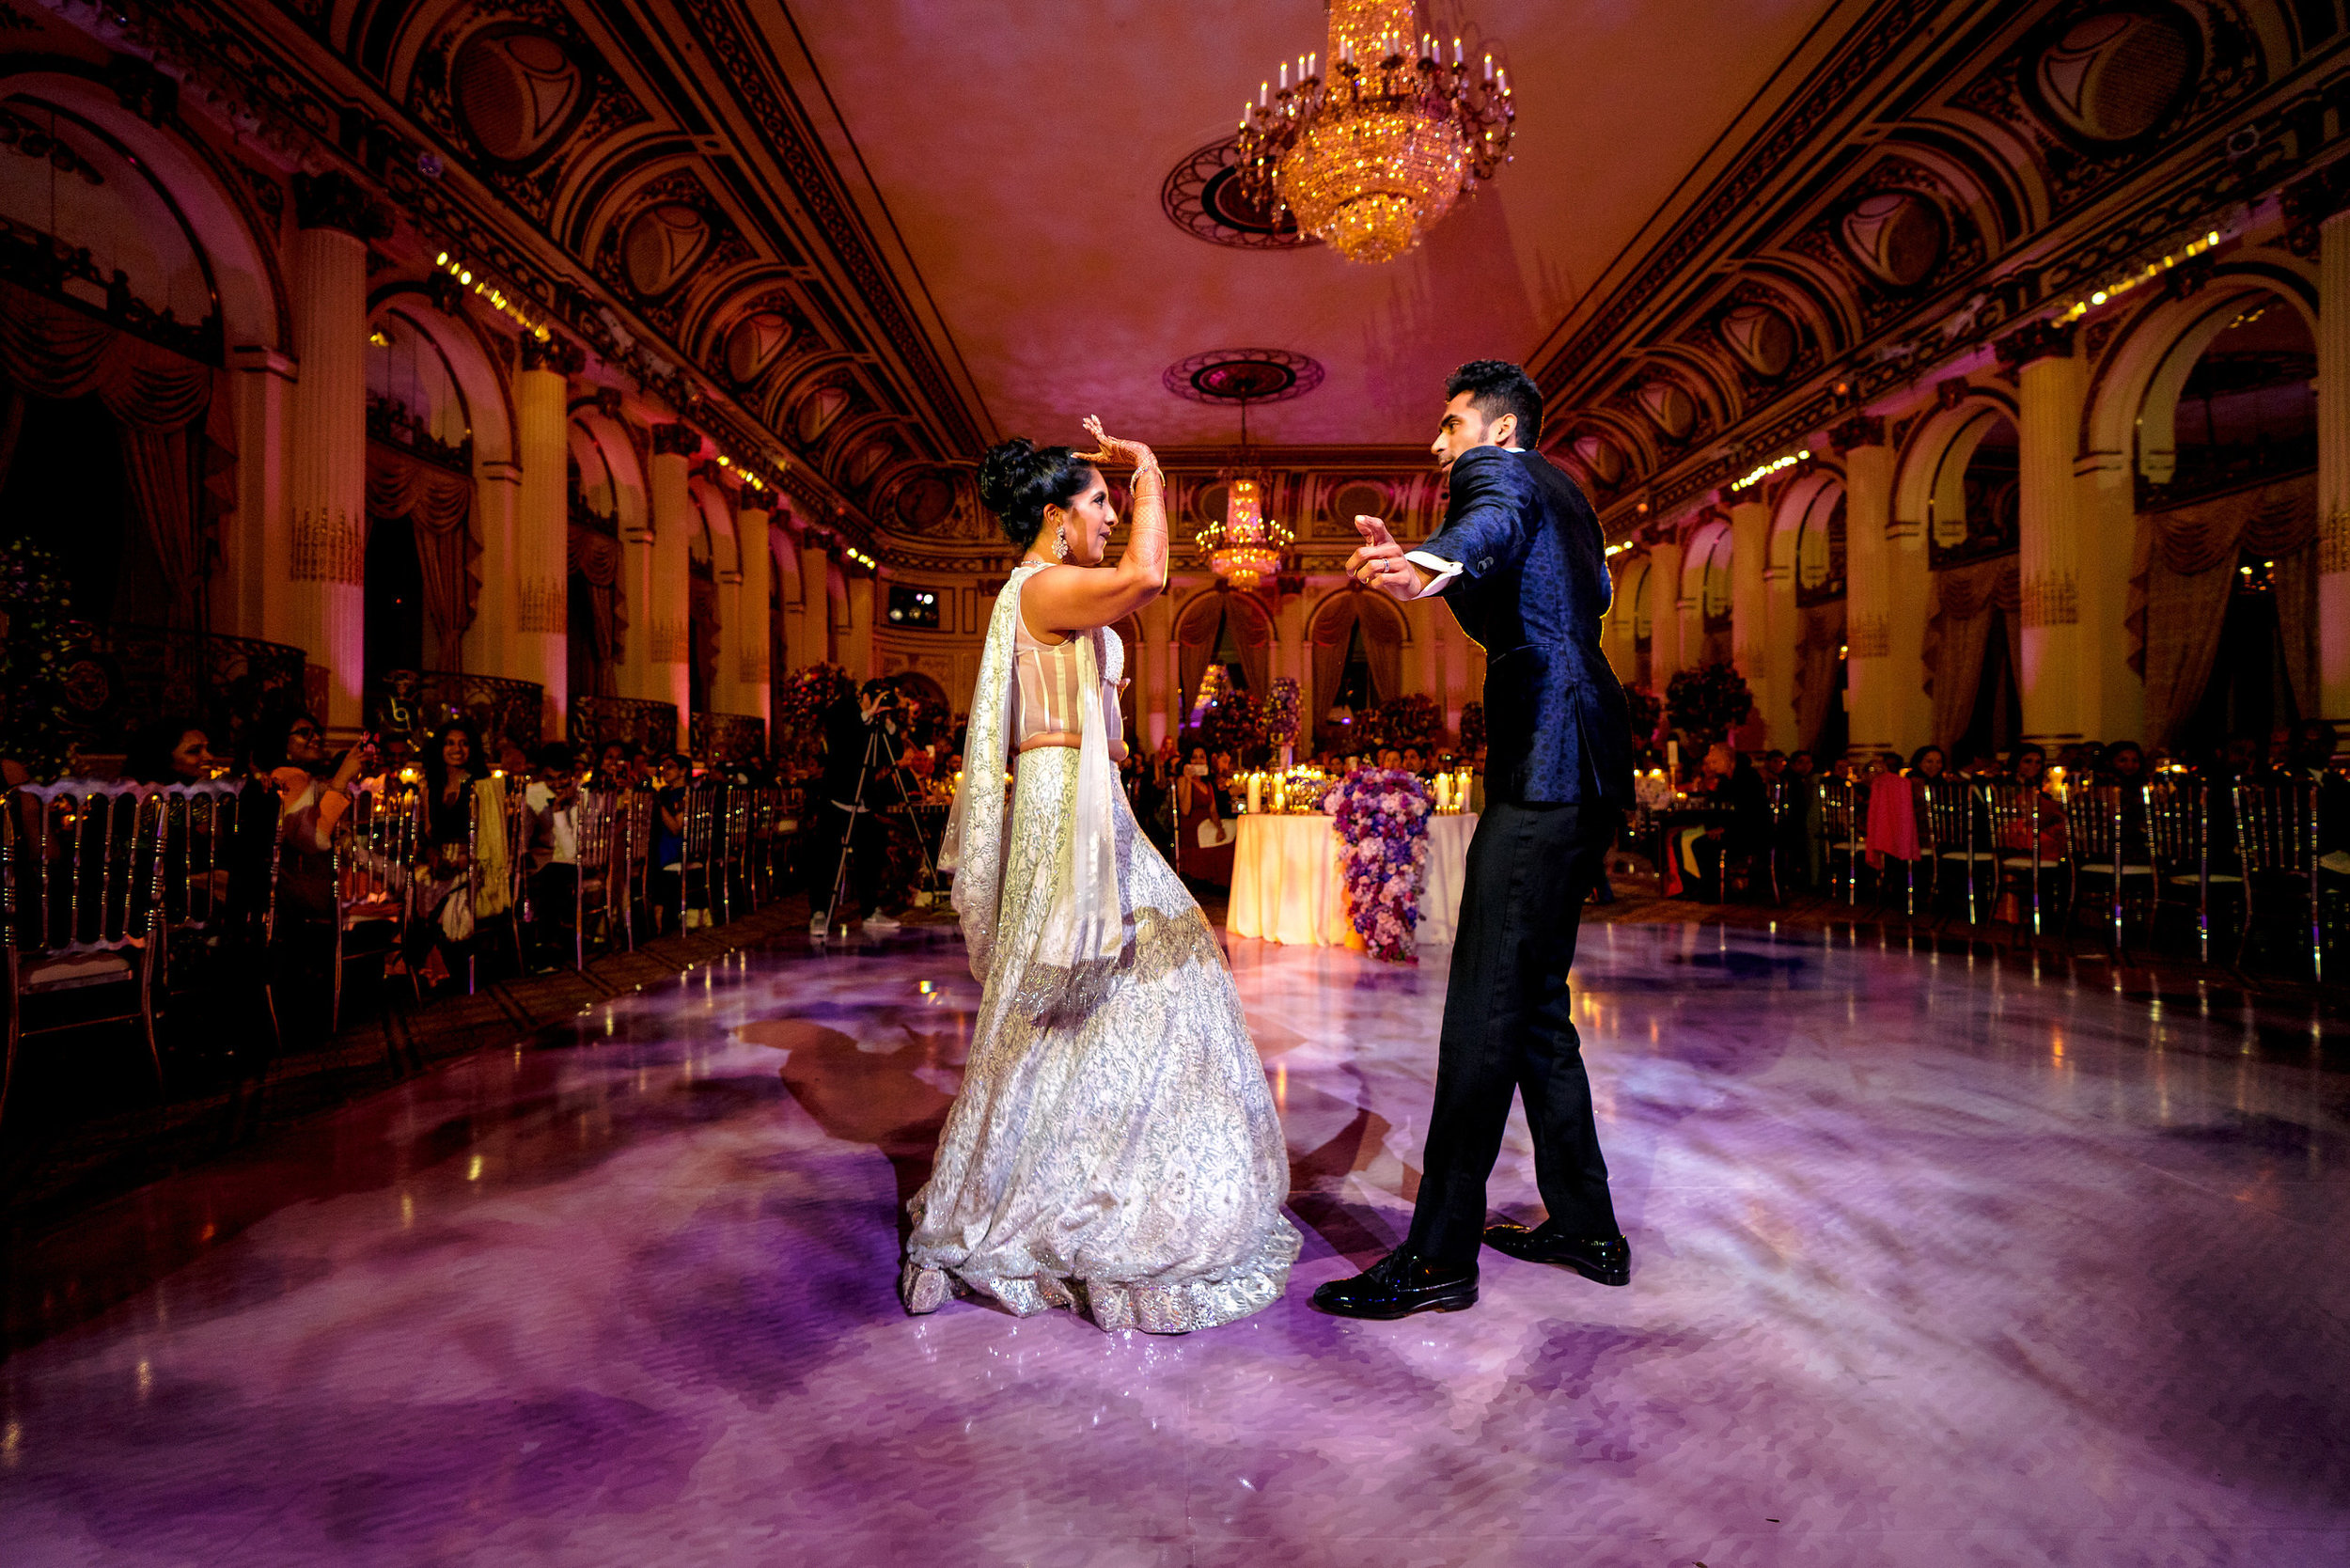 INDIAN WEDDING BRIDE AND GROOM DANCE RECEPTION.JPG